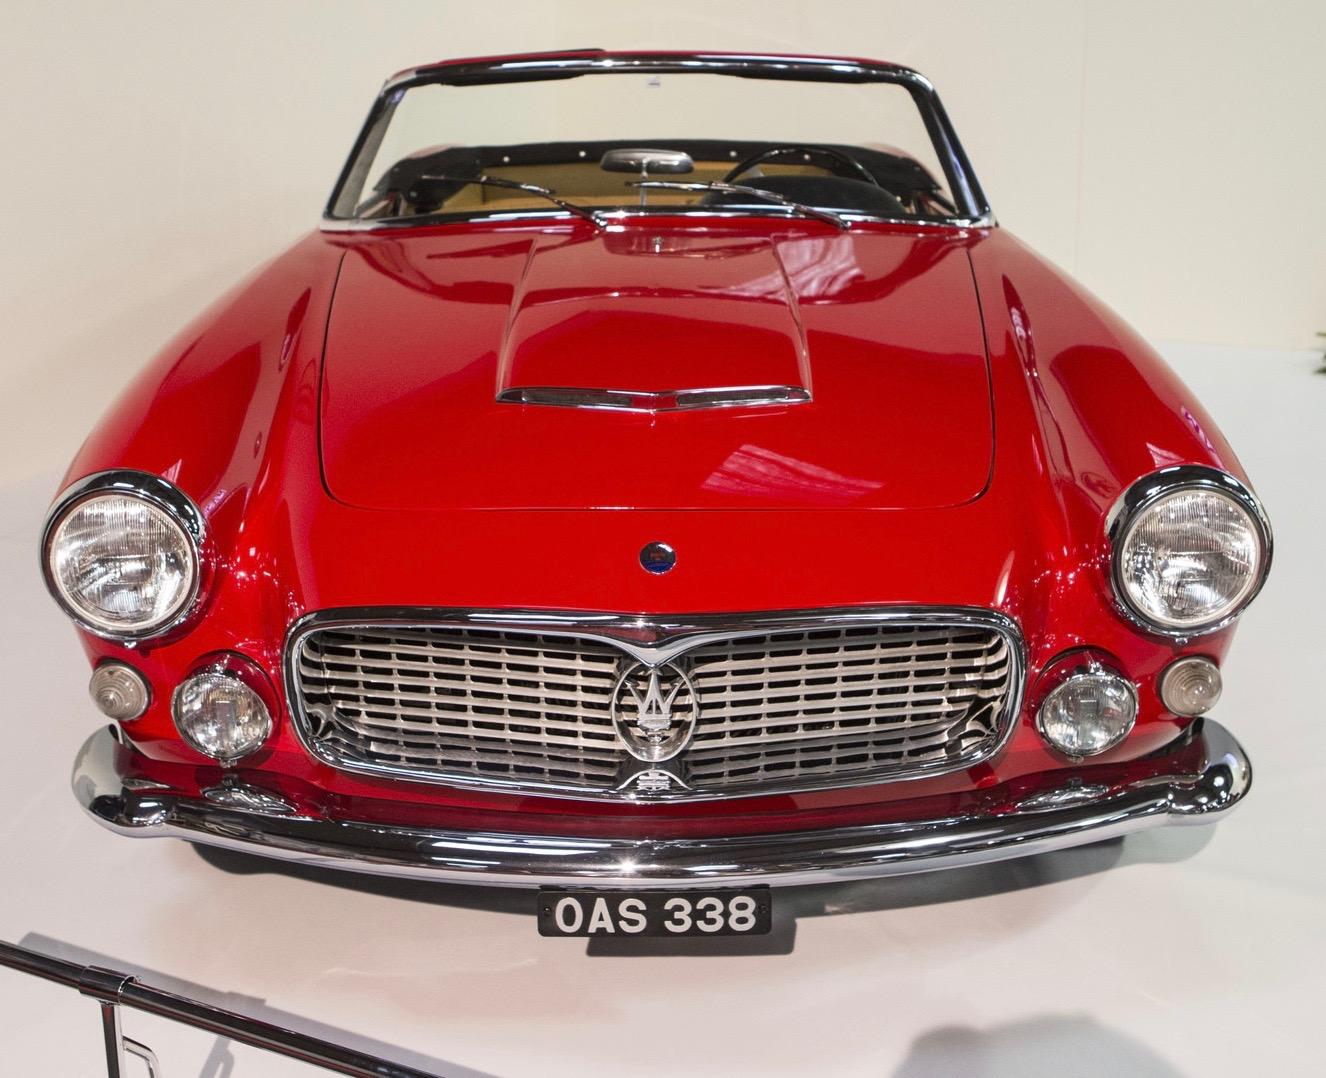 , Bonhams enjoys bidding, exposure at inaugural Padua auction, ClassicCars.com Journal